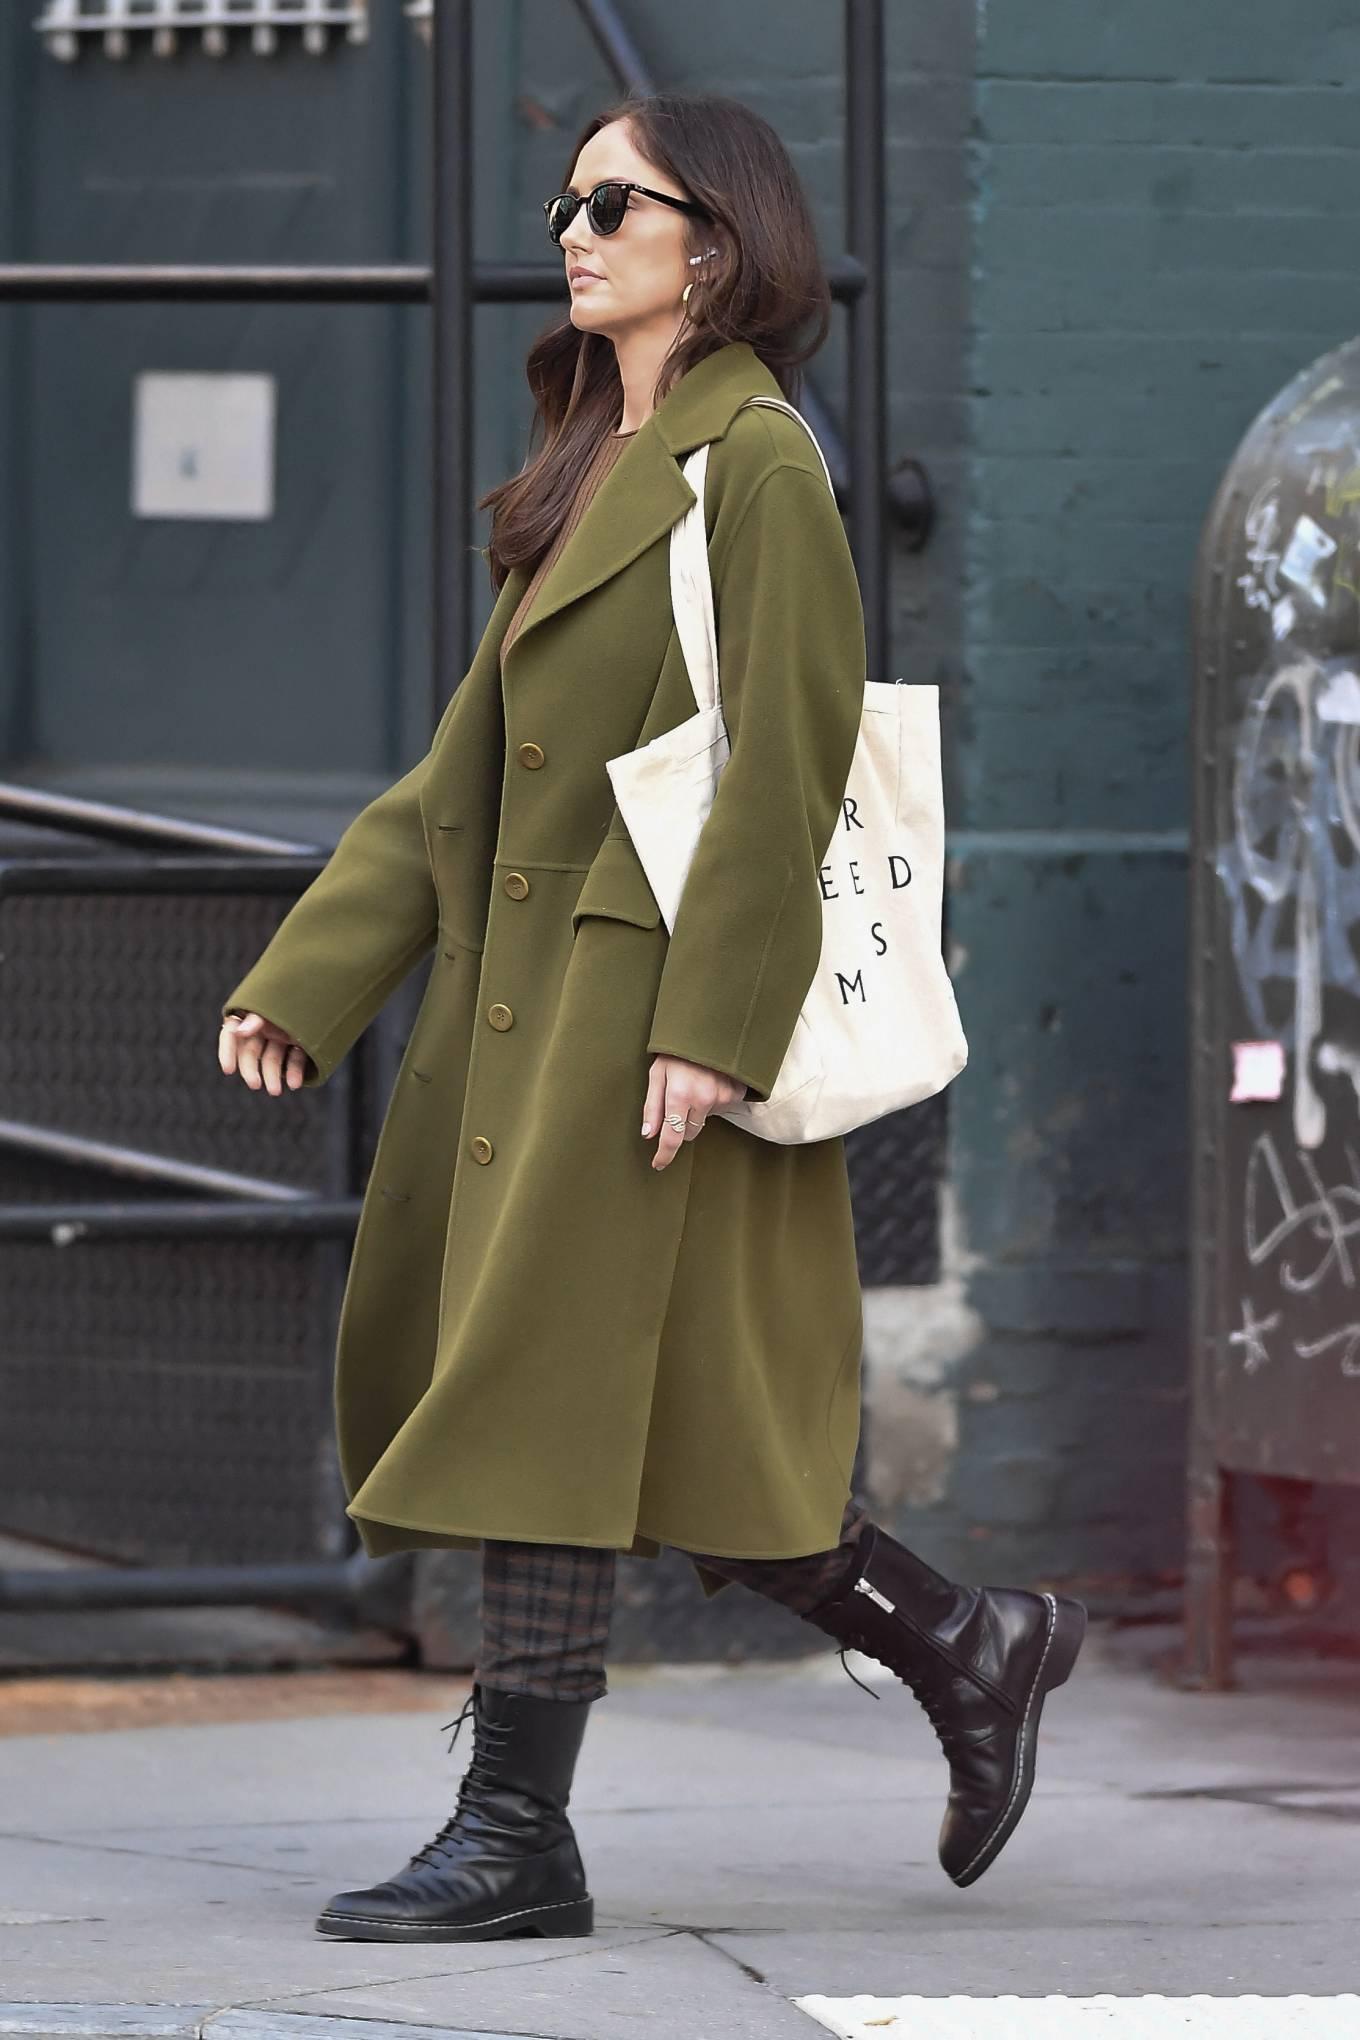 Minka Kelly 2021 : Minka Kelly – In olive green runs errands in New York-25